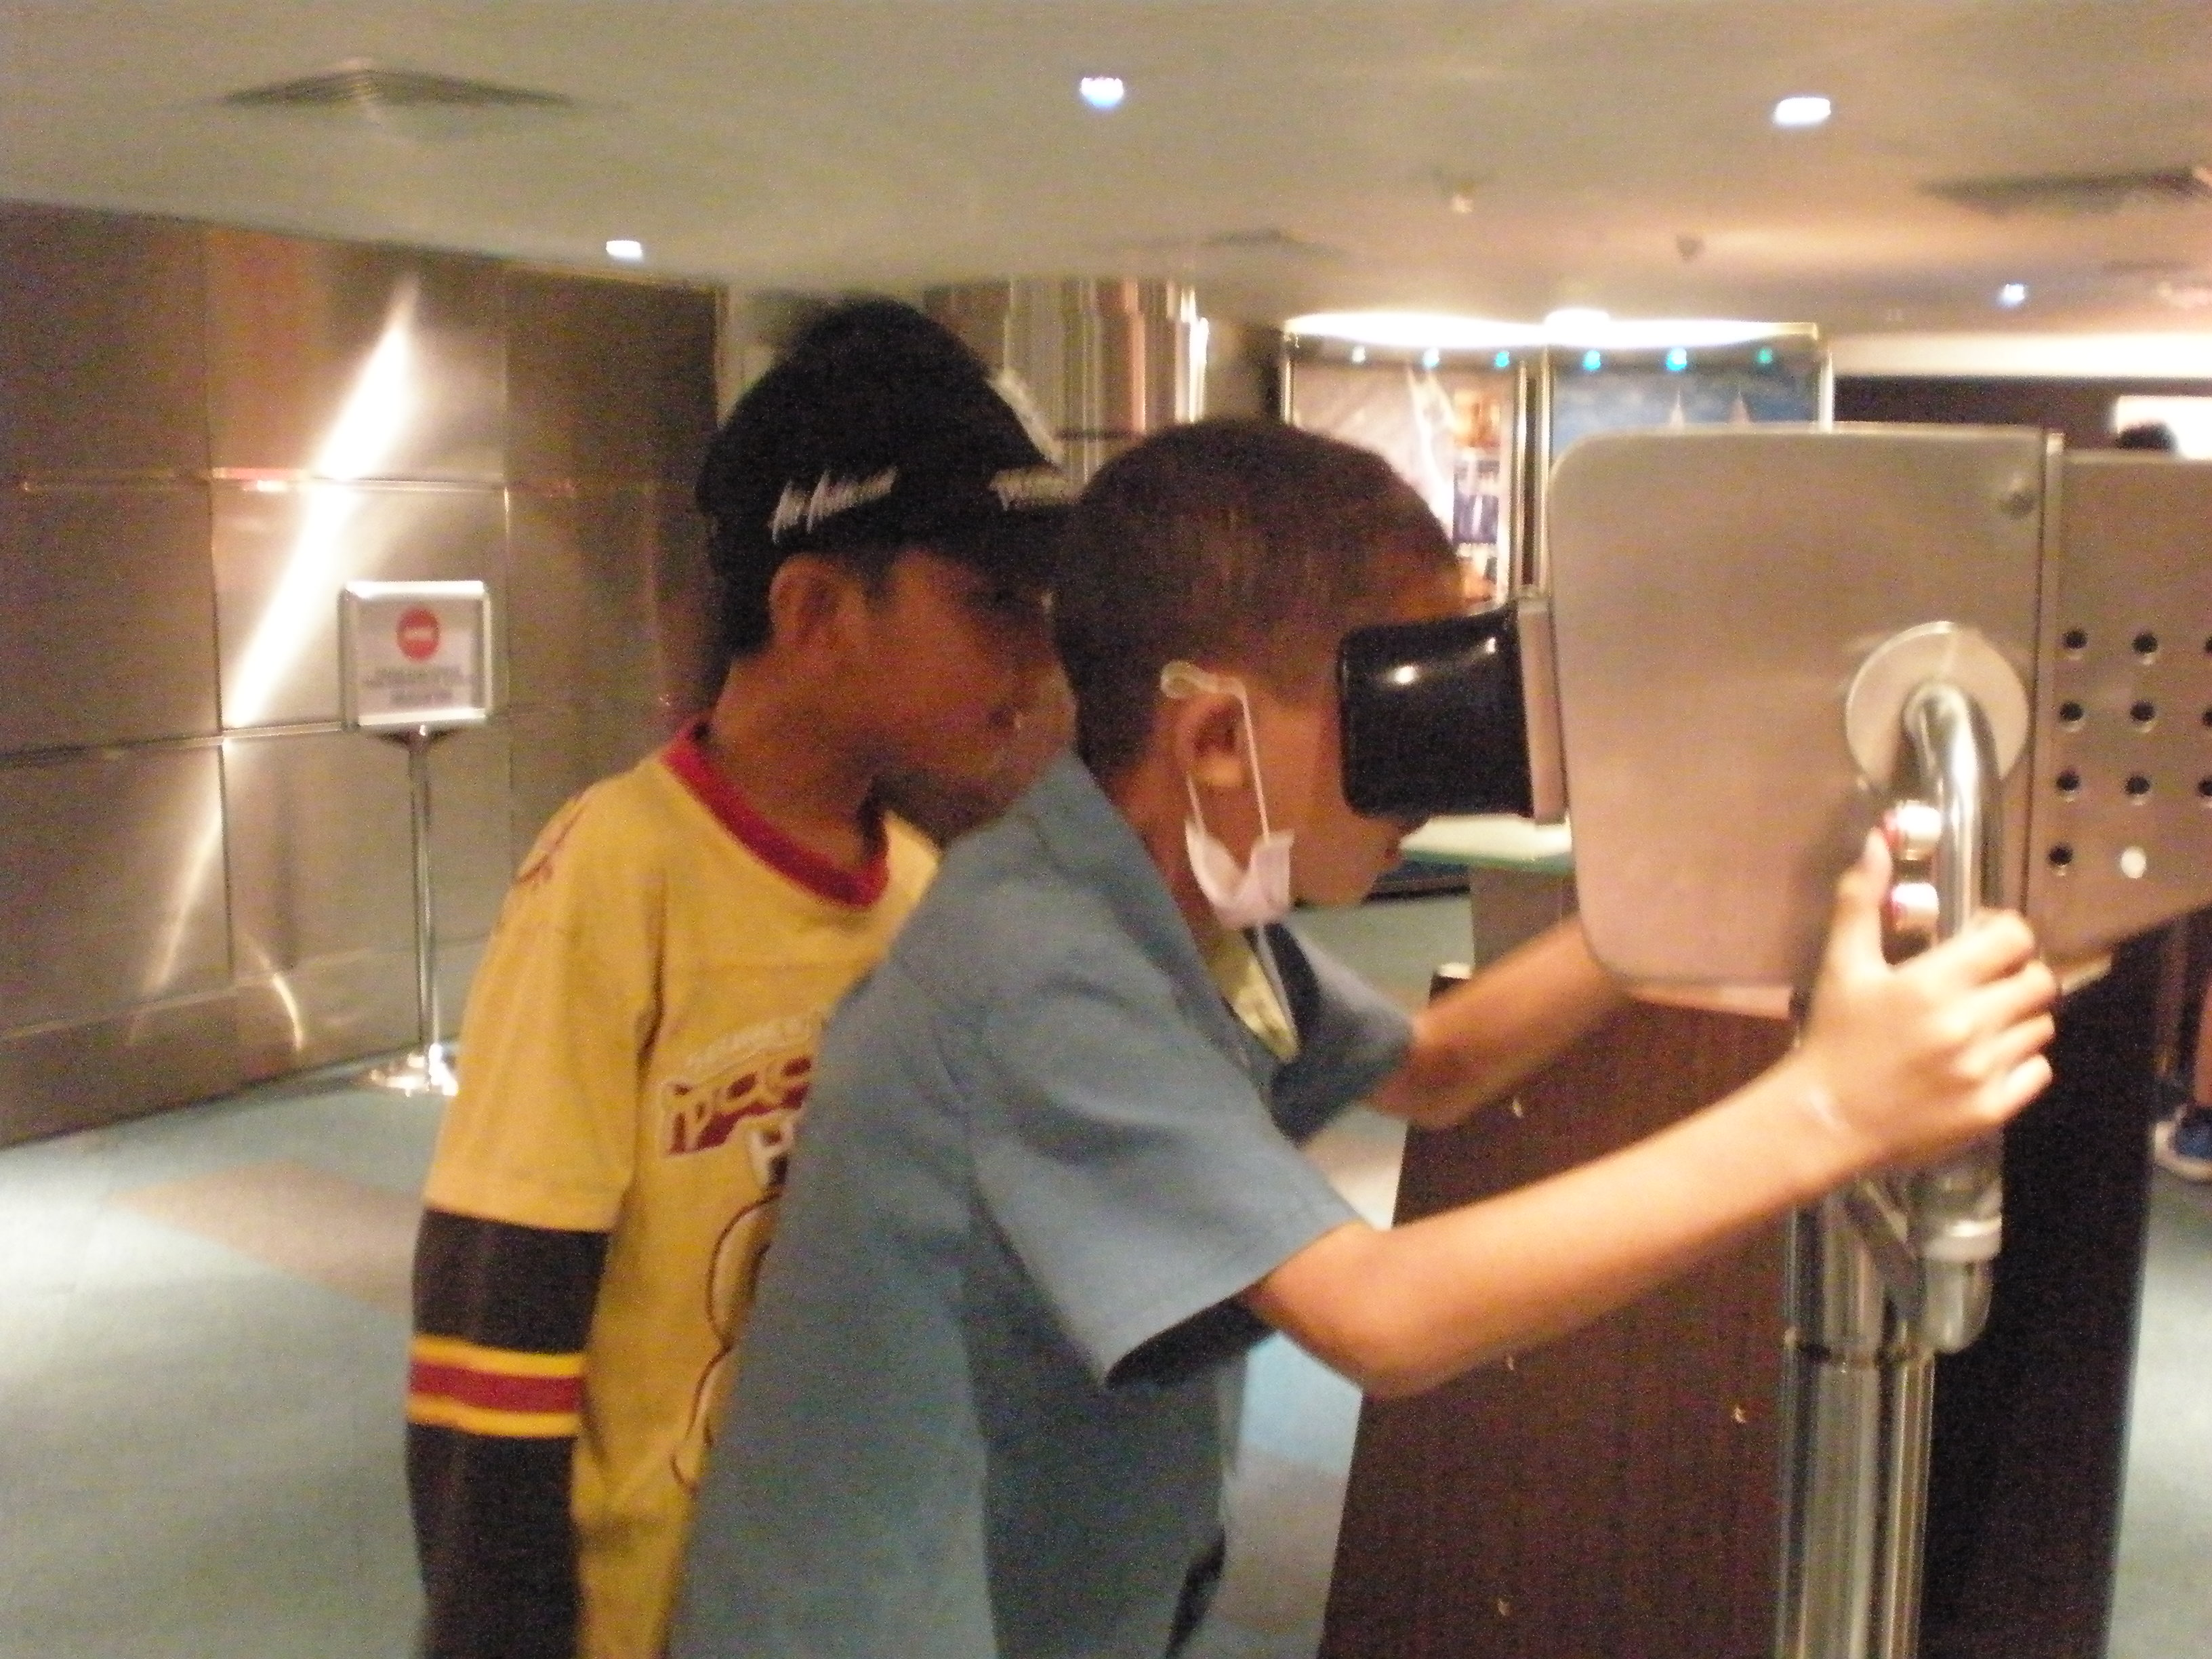 Ahmad Adib Ahadin, berusia 9 tahun, pelajar Tahun 3 SK Kipaku Tambunan dan SUIS Tambunan, Sabah begitu serius menggunakan alat canggih di Menara KLCC untuk melihat keindahan sekeliling KLCC. Pendidikan efektif hari ini bukan setakat melihat, mereka juga perlu menyentuh dan merasa